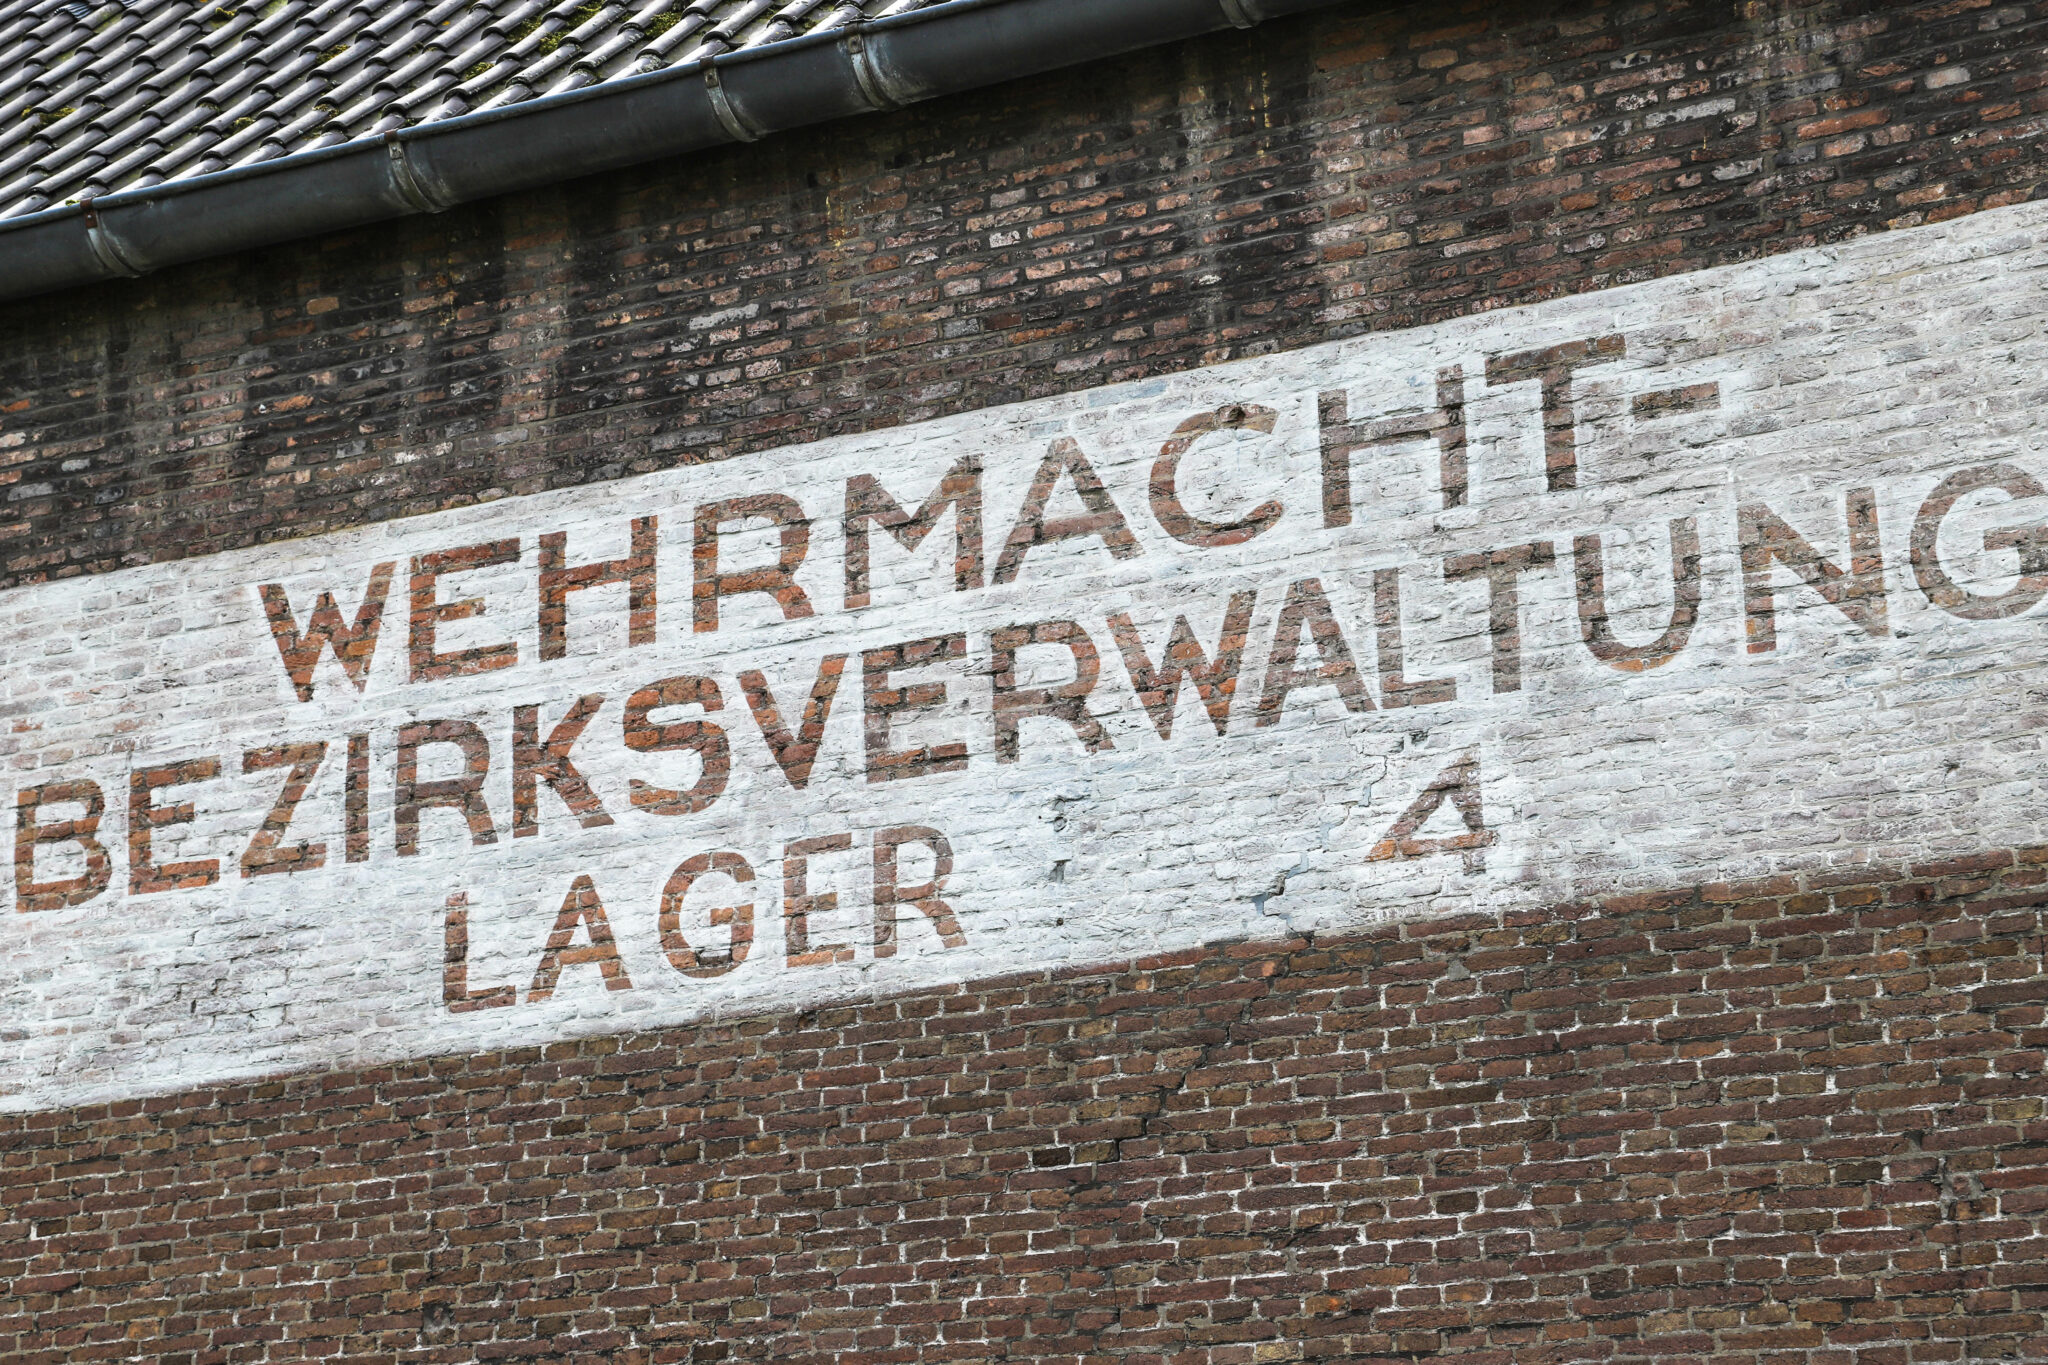 klein arsenaal tekst oorlog bergen op zoom Duits gebouw (3) klein arsenaal